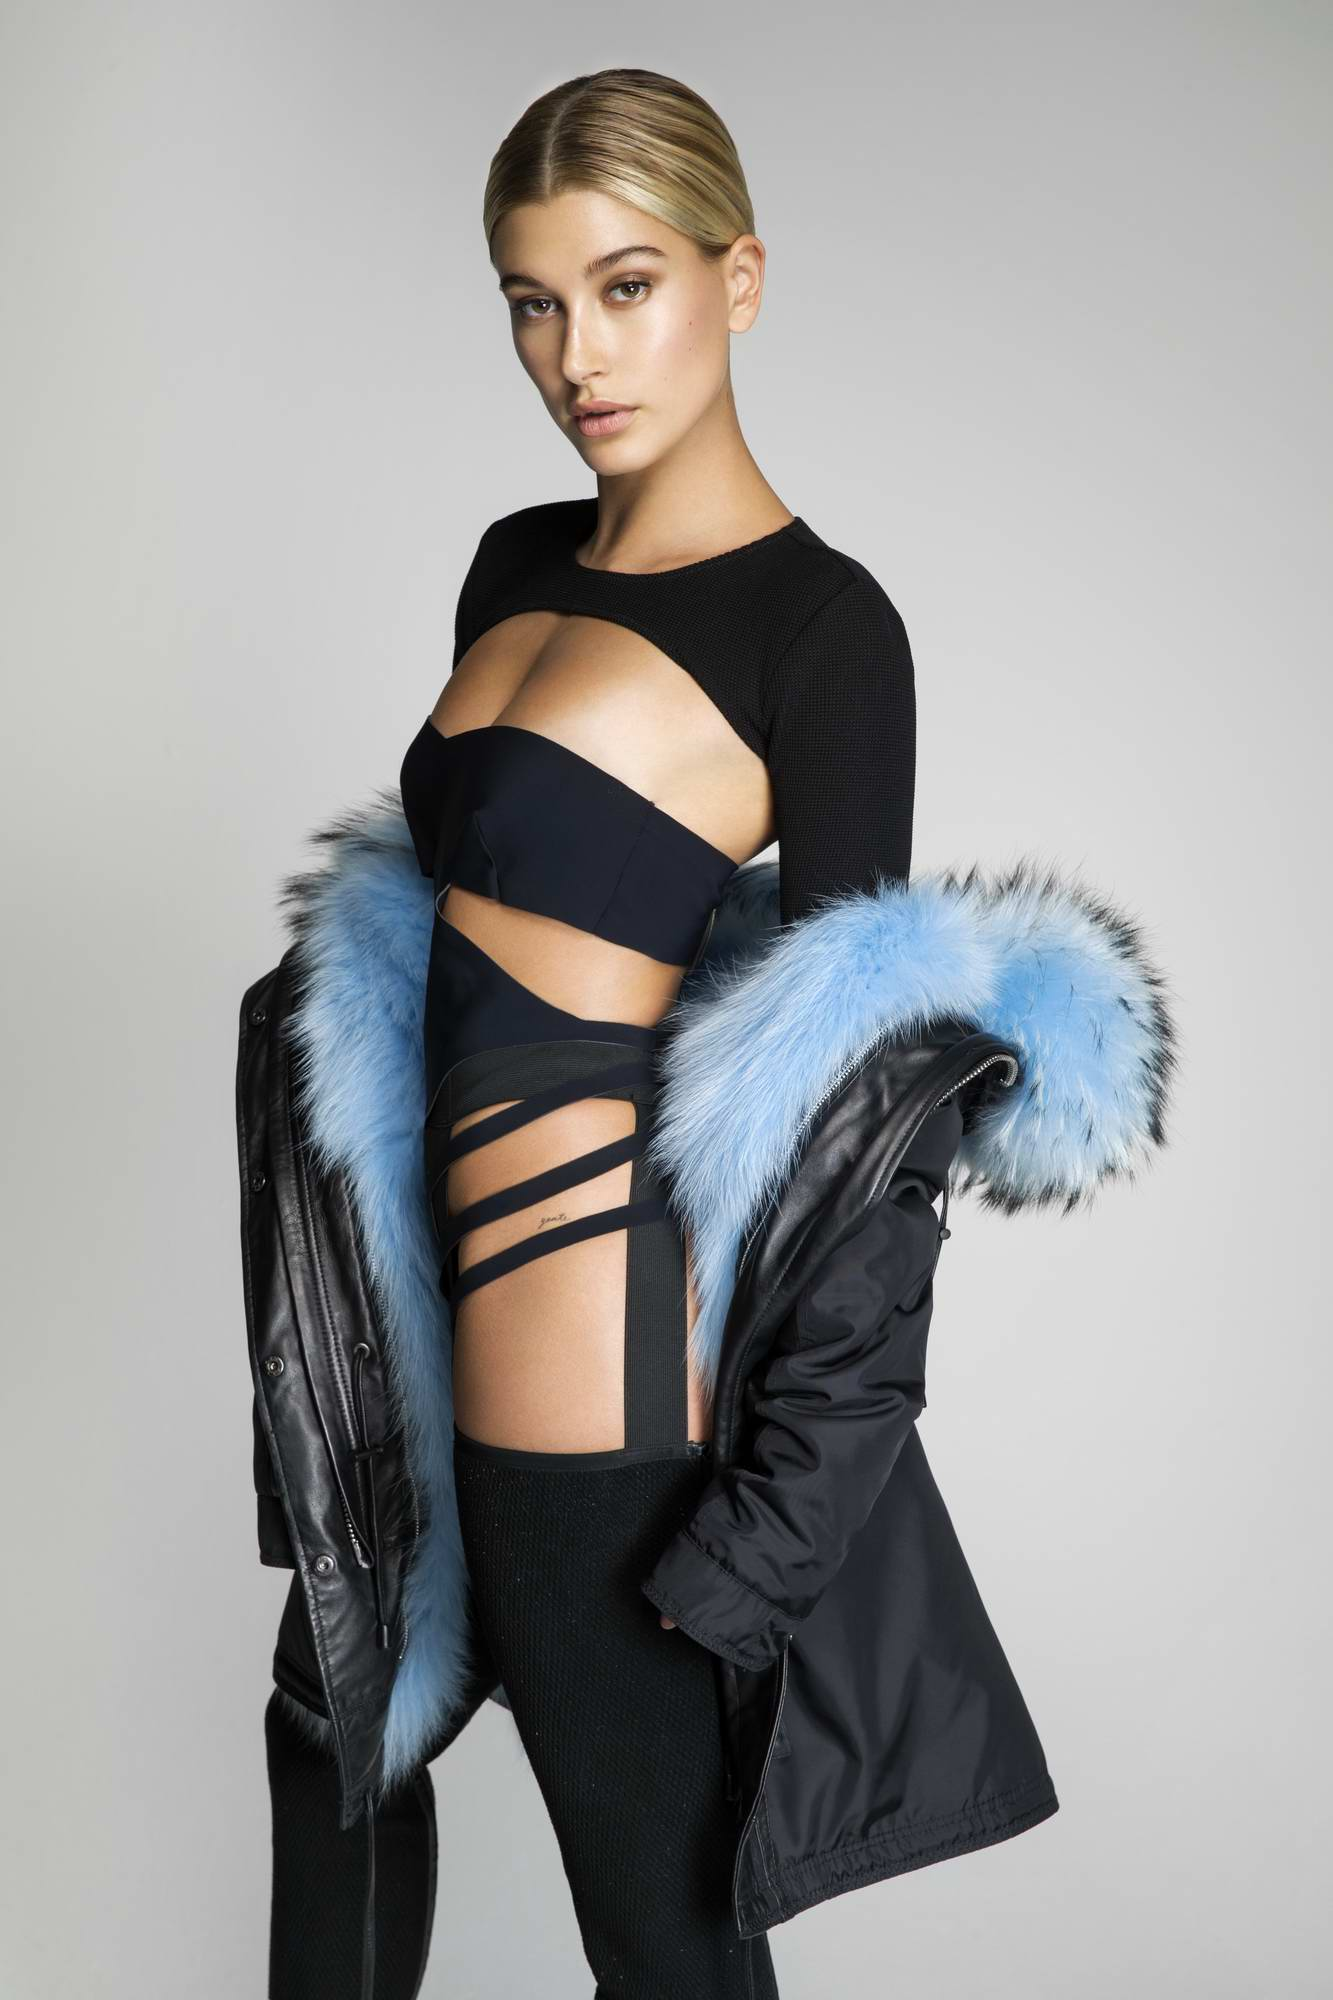 Hailey Baldwin photoshoot for Nicole Benisti Autumn-Winter 2017 Campaign, September 2017